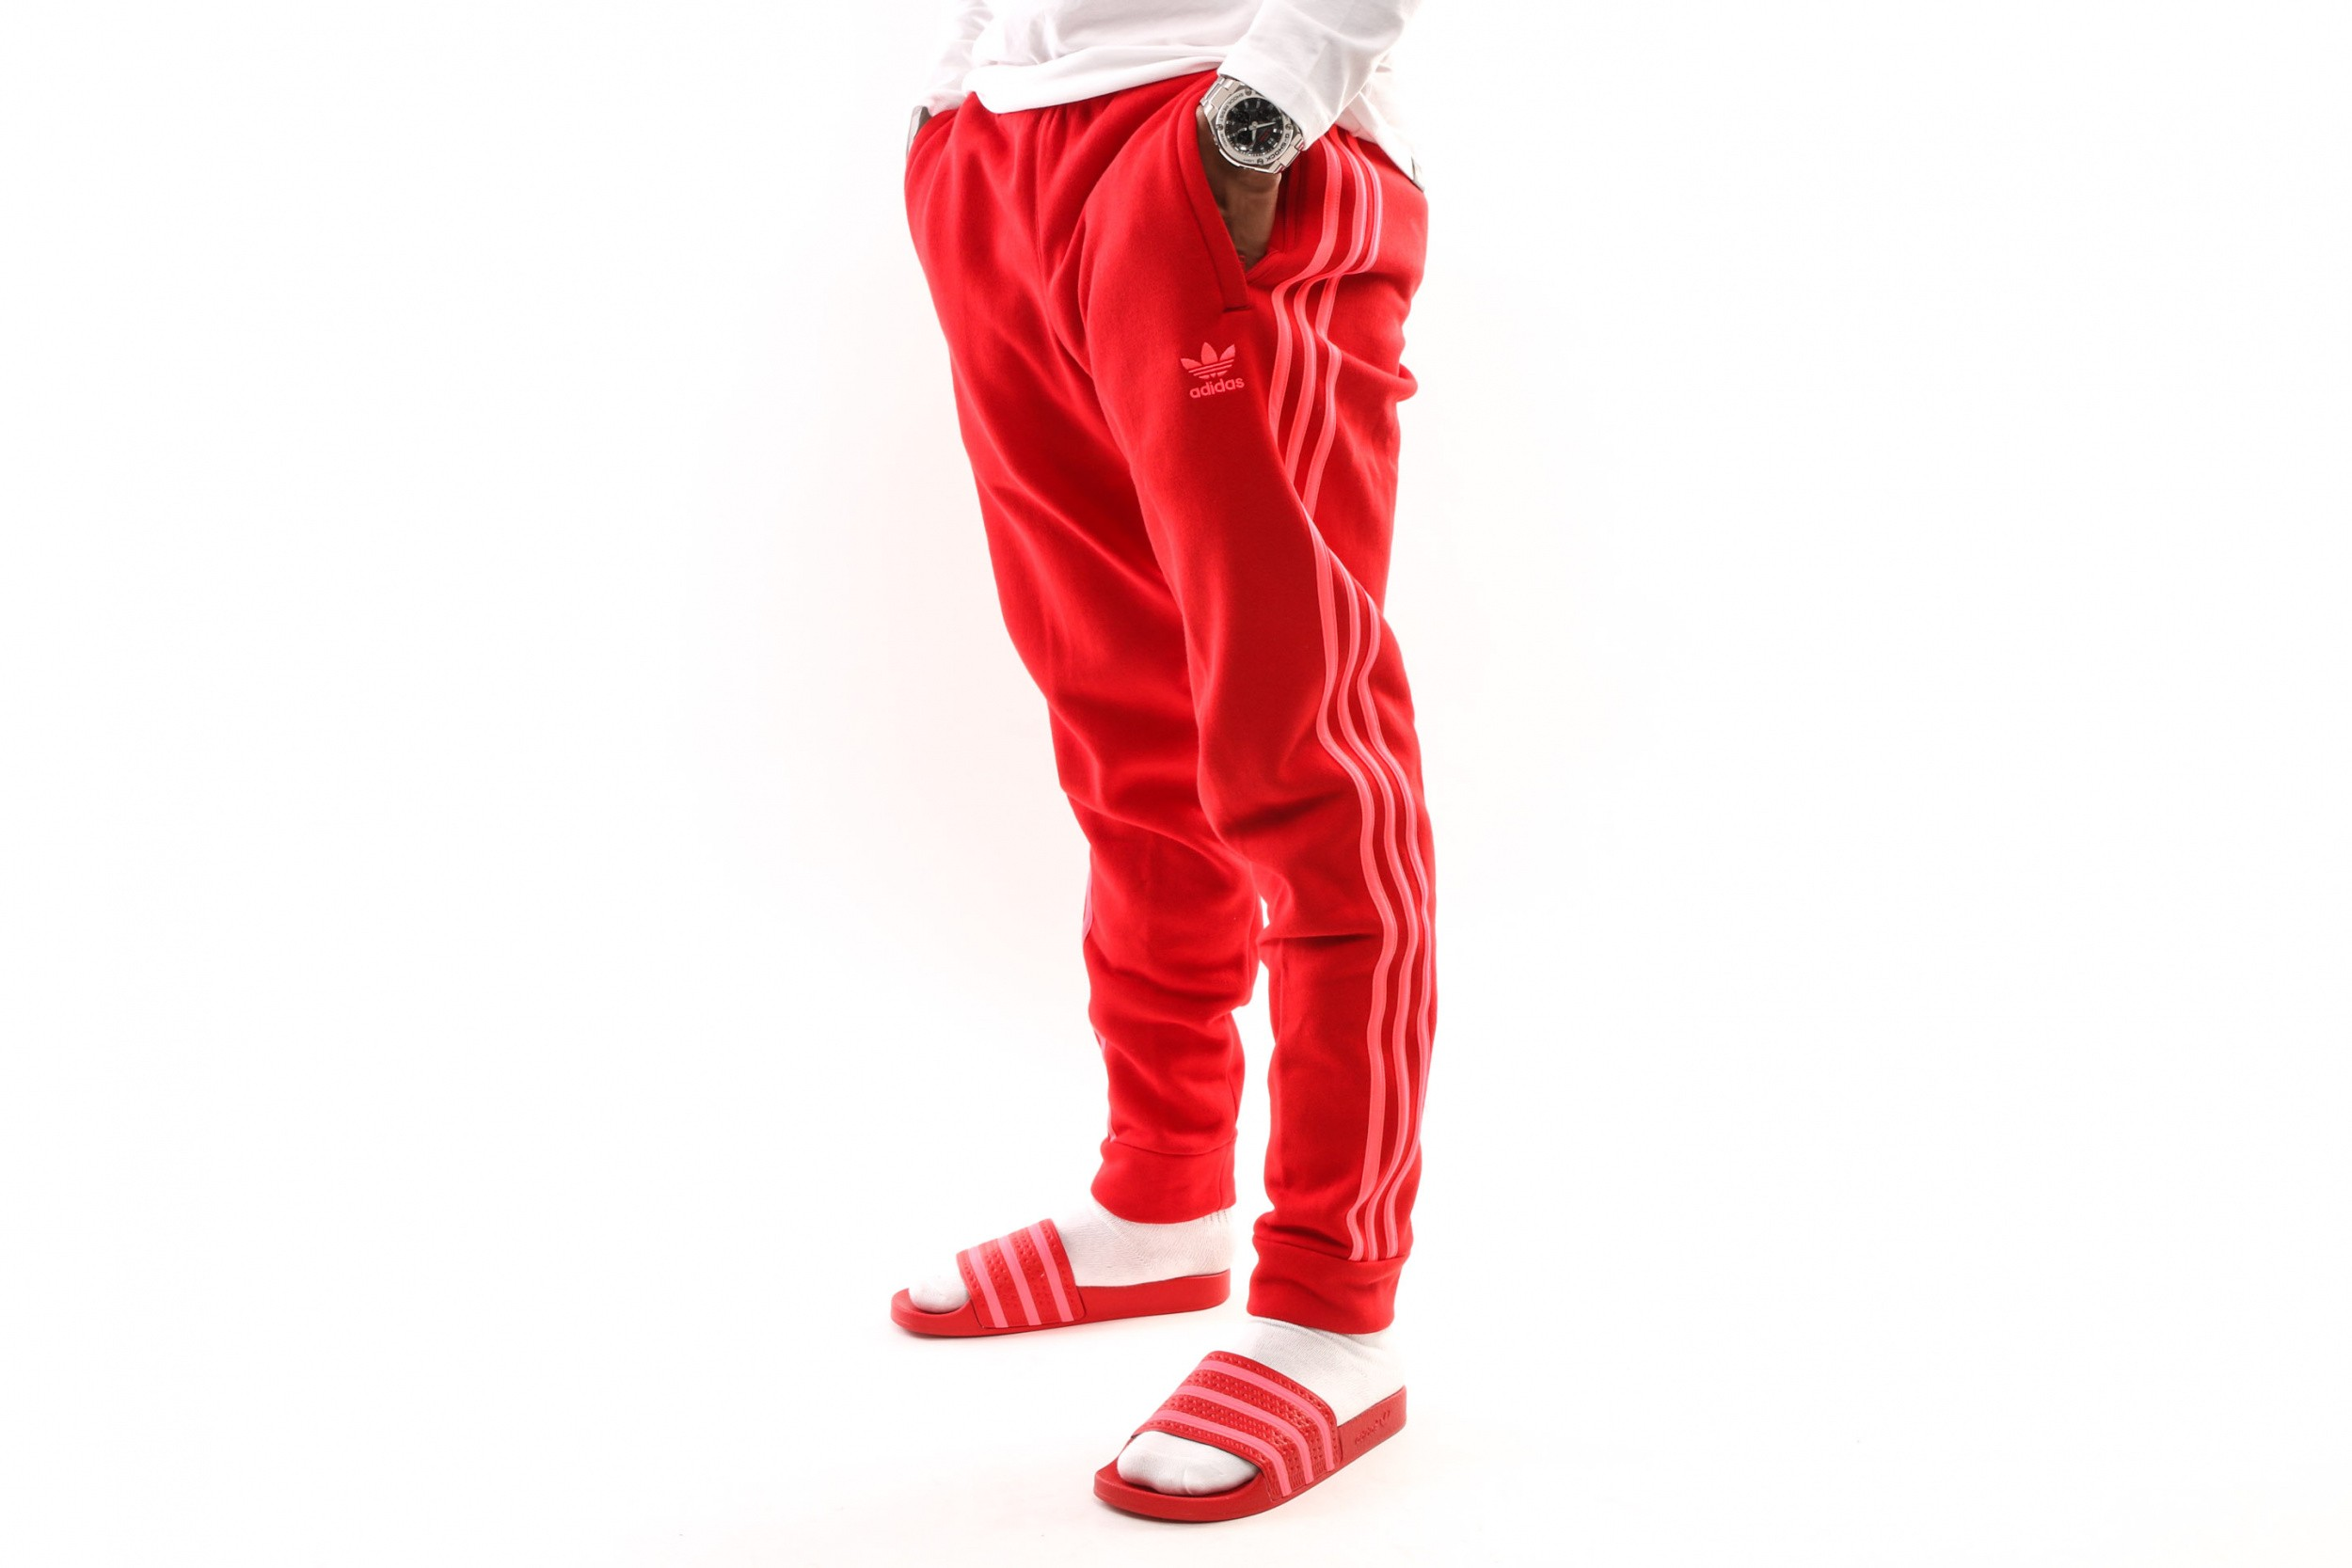 cf98f5f503b Adidas Trainingsbroek kopen? Shop je items bij Go Britain | Go ...